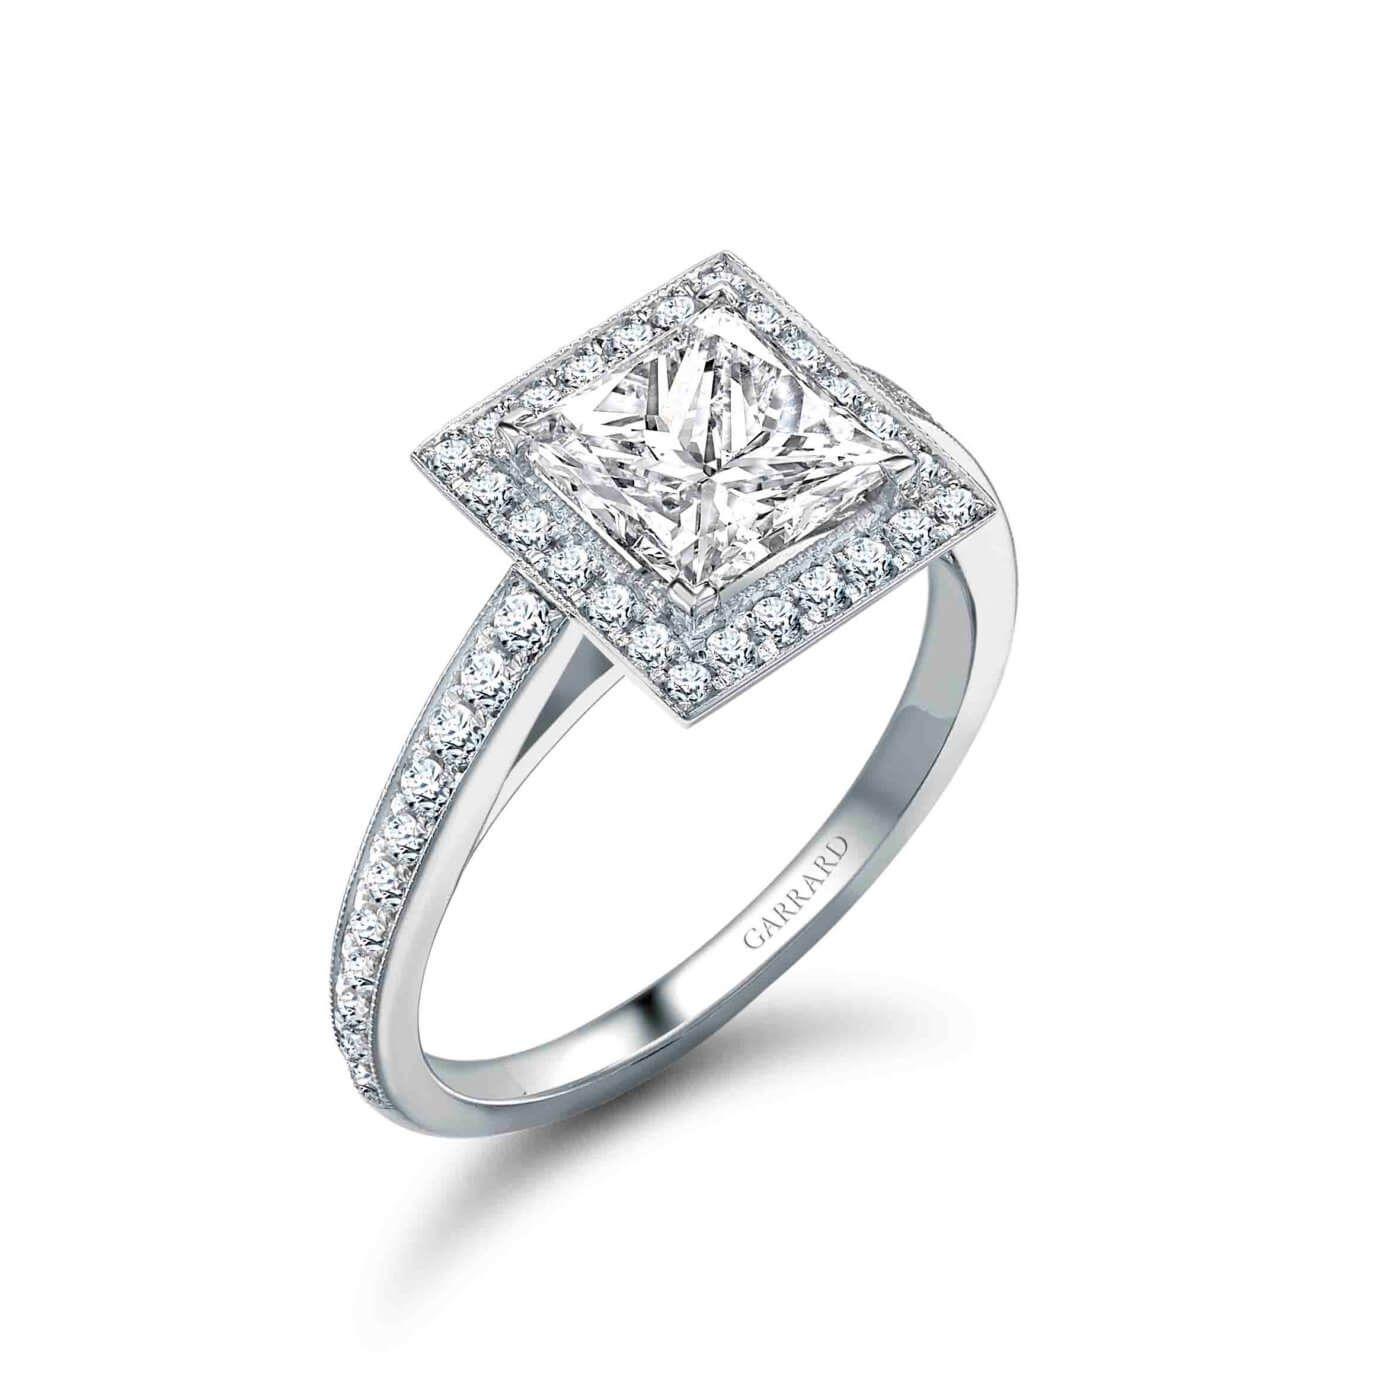 The Garrard Evermore Engagement Ring House of Garrard